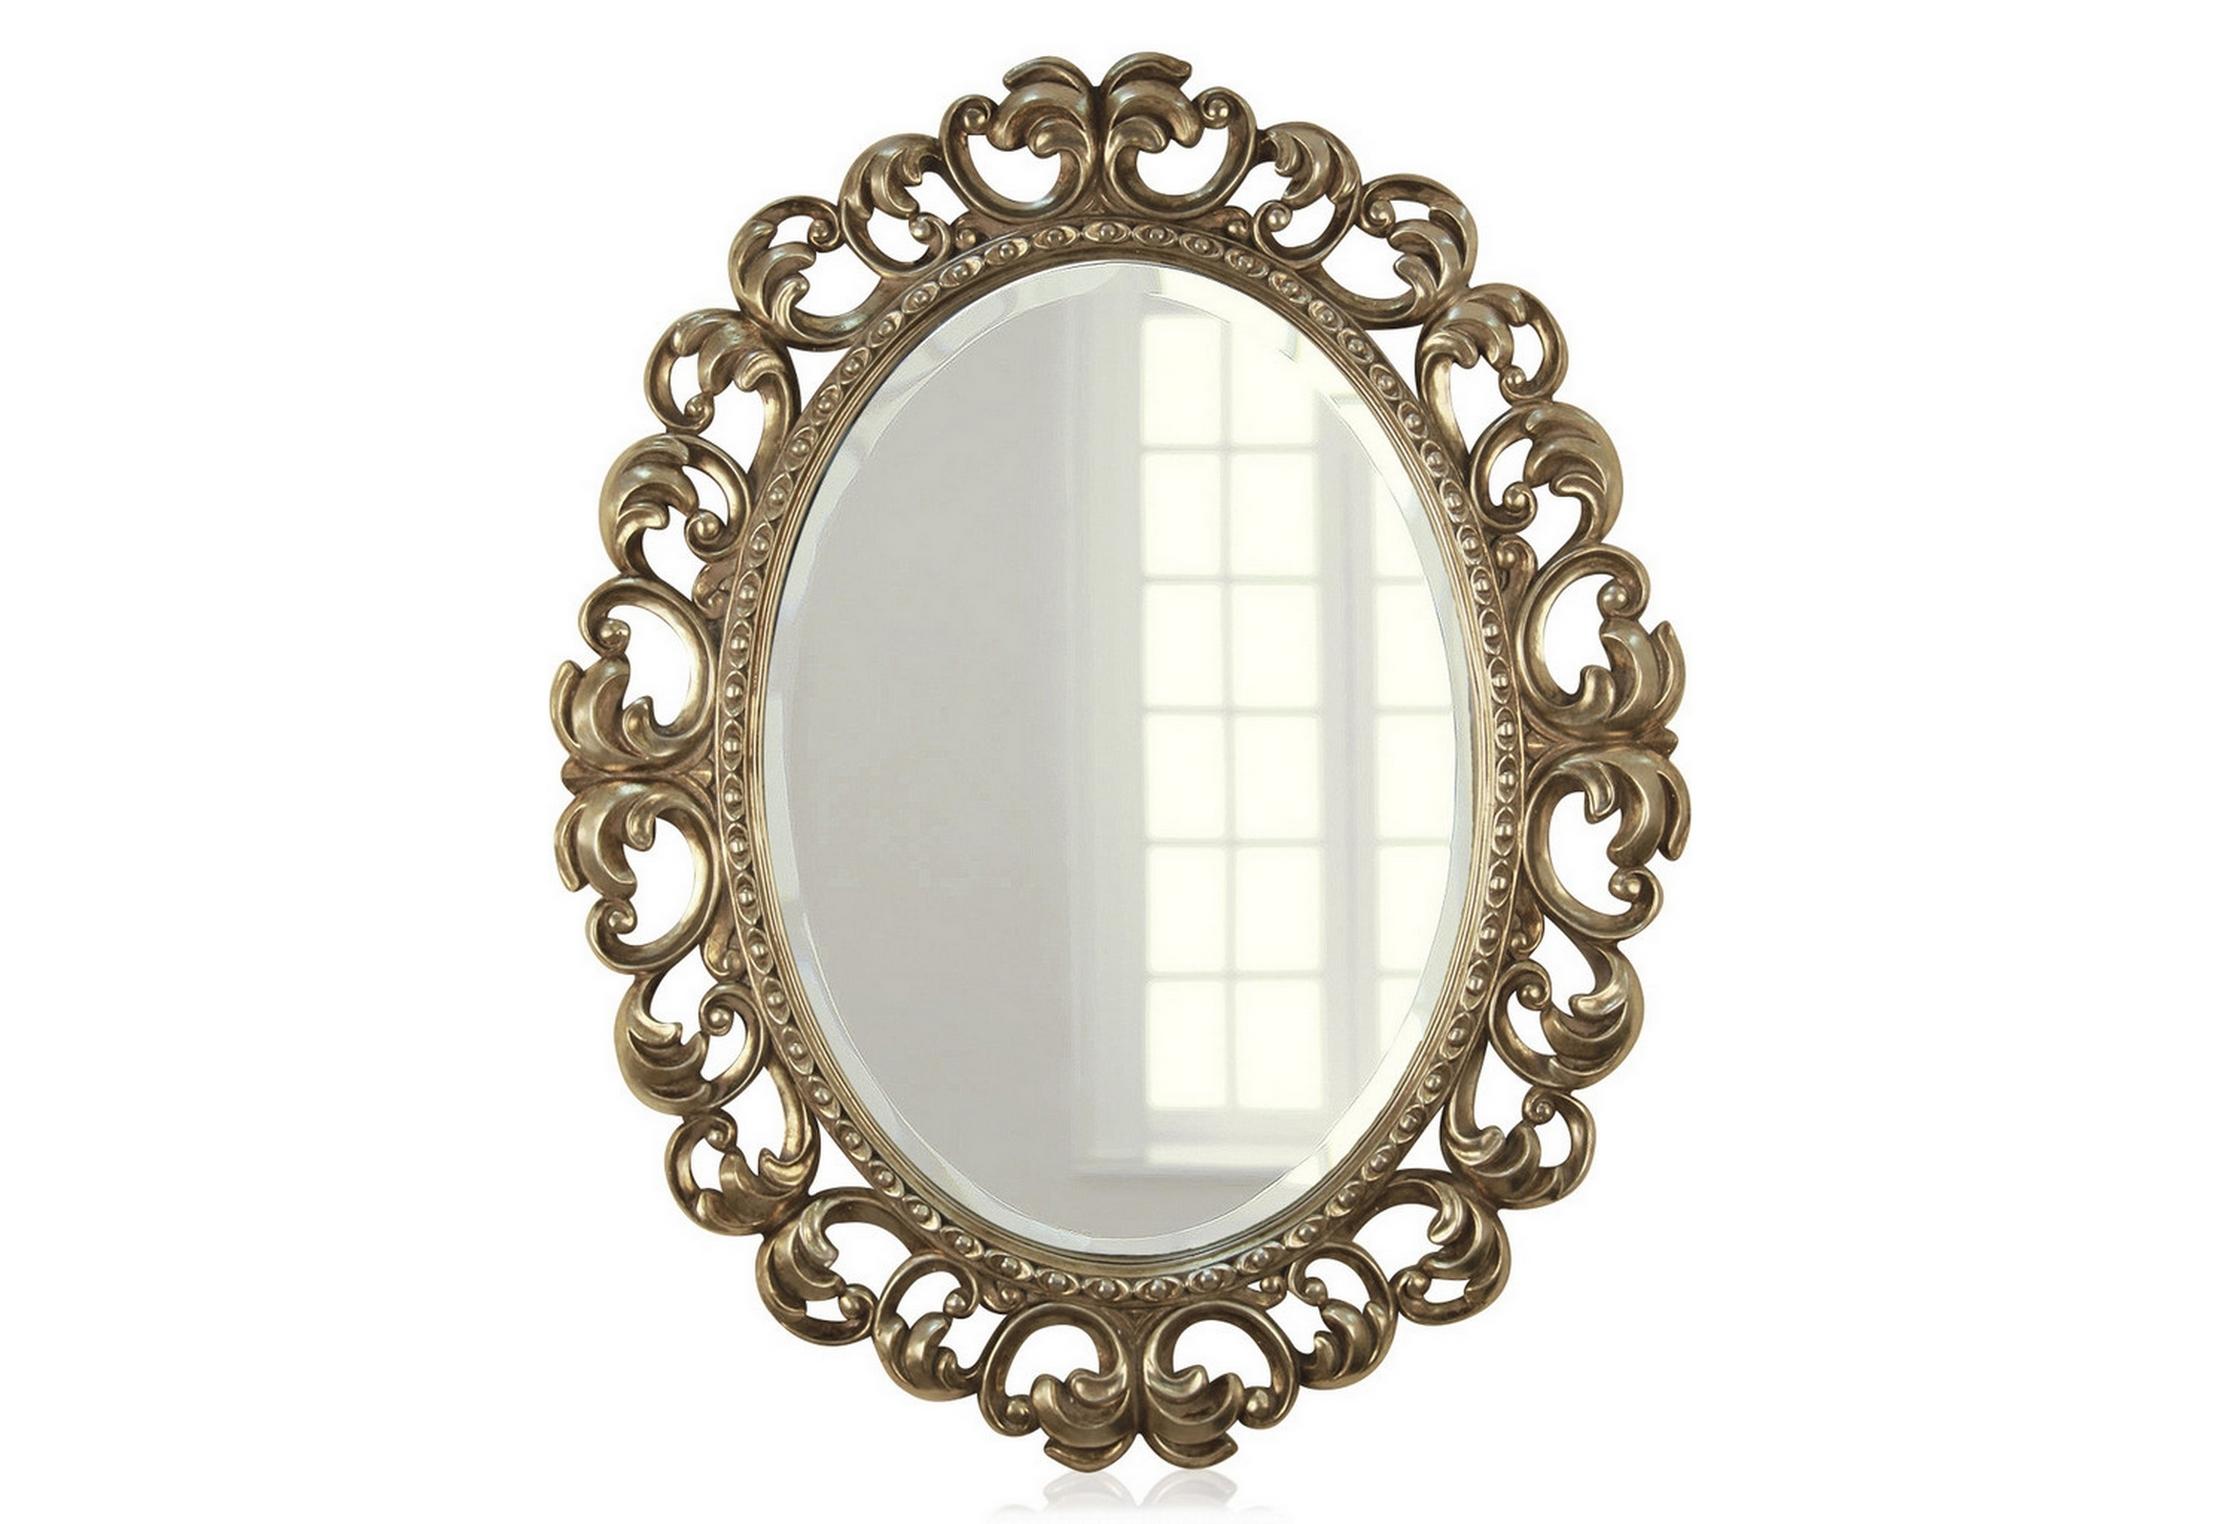 Зеркало ШербурНастенные зеркала<br>Материал: дерево, полиуретан.<br><br>Material: Пластик<br>Width см: 80<br>Depth см: 4<br>Height см: 100